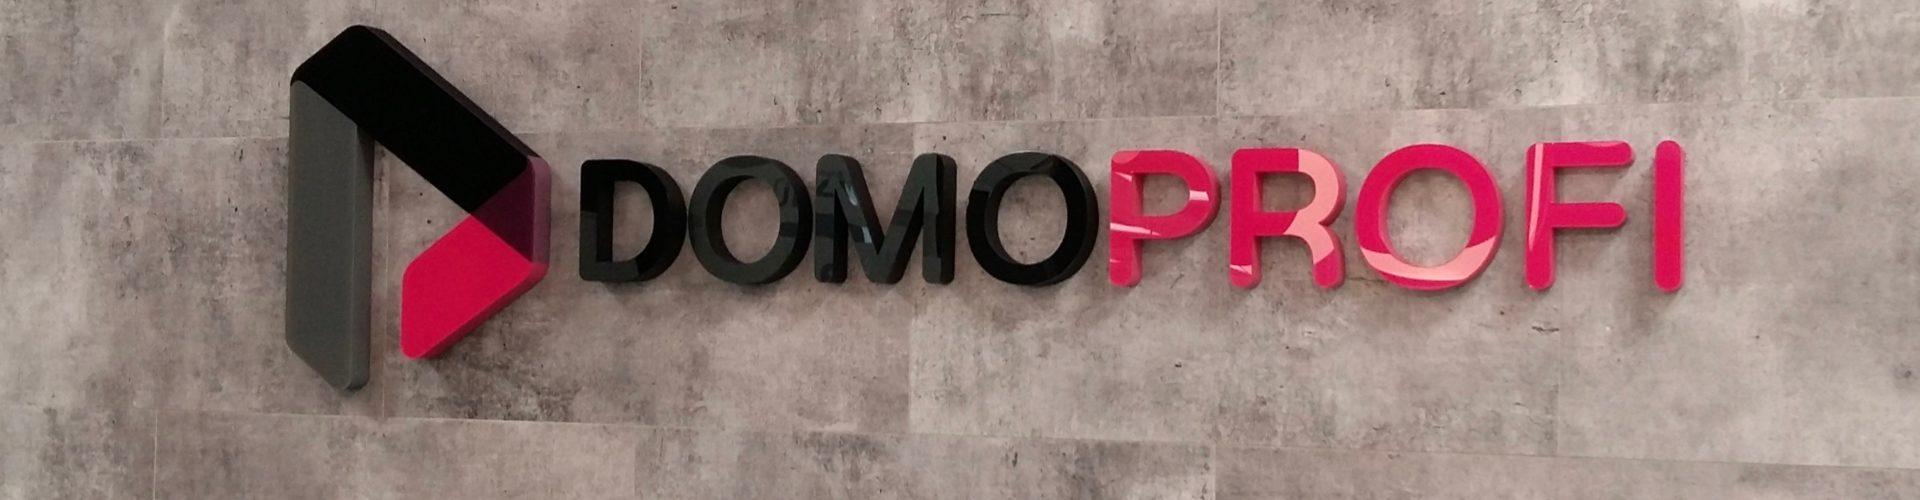 Znaki 3d Domoprofi